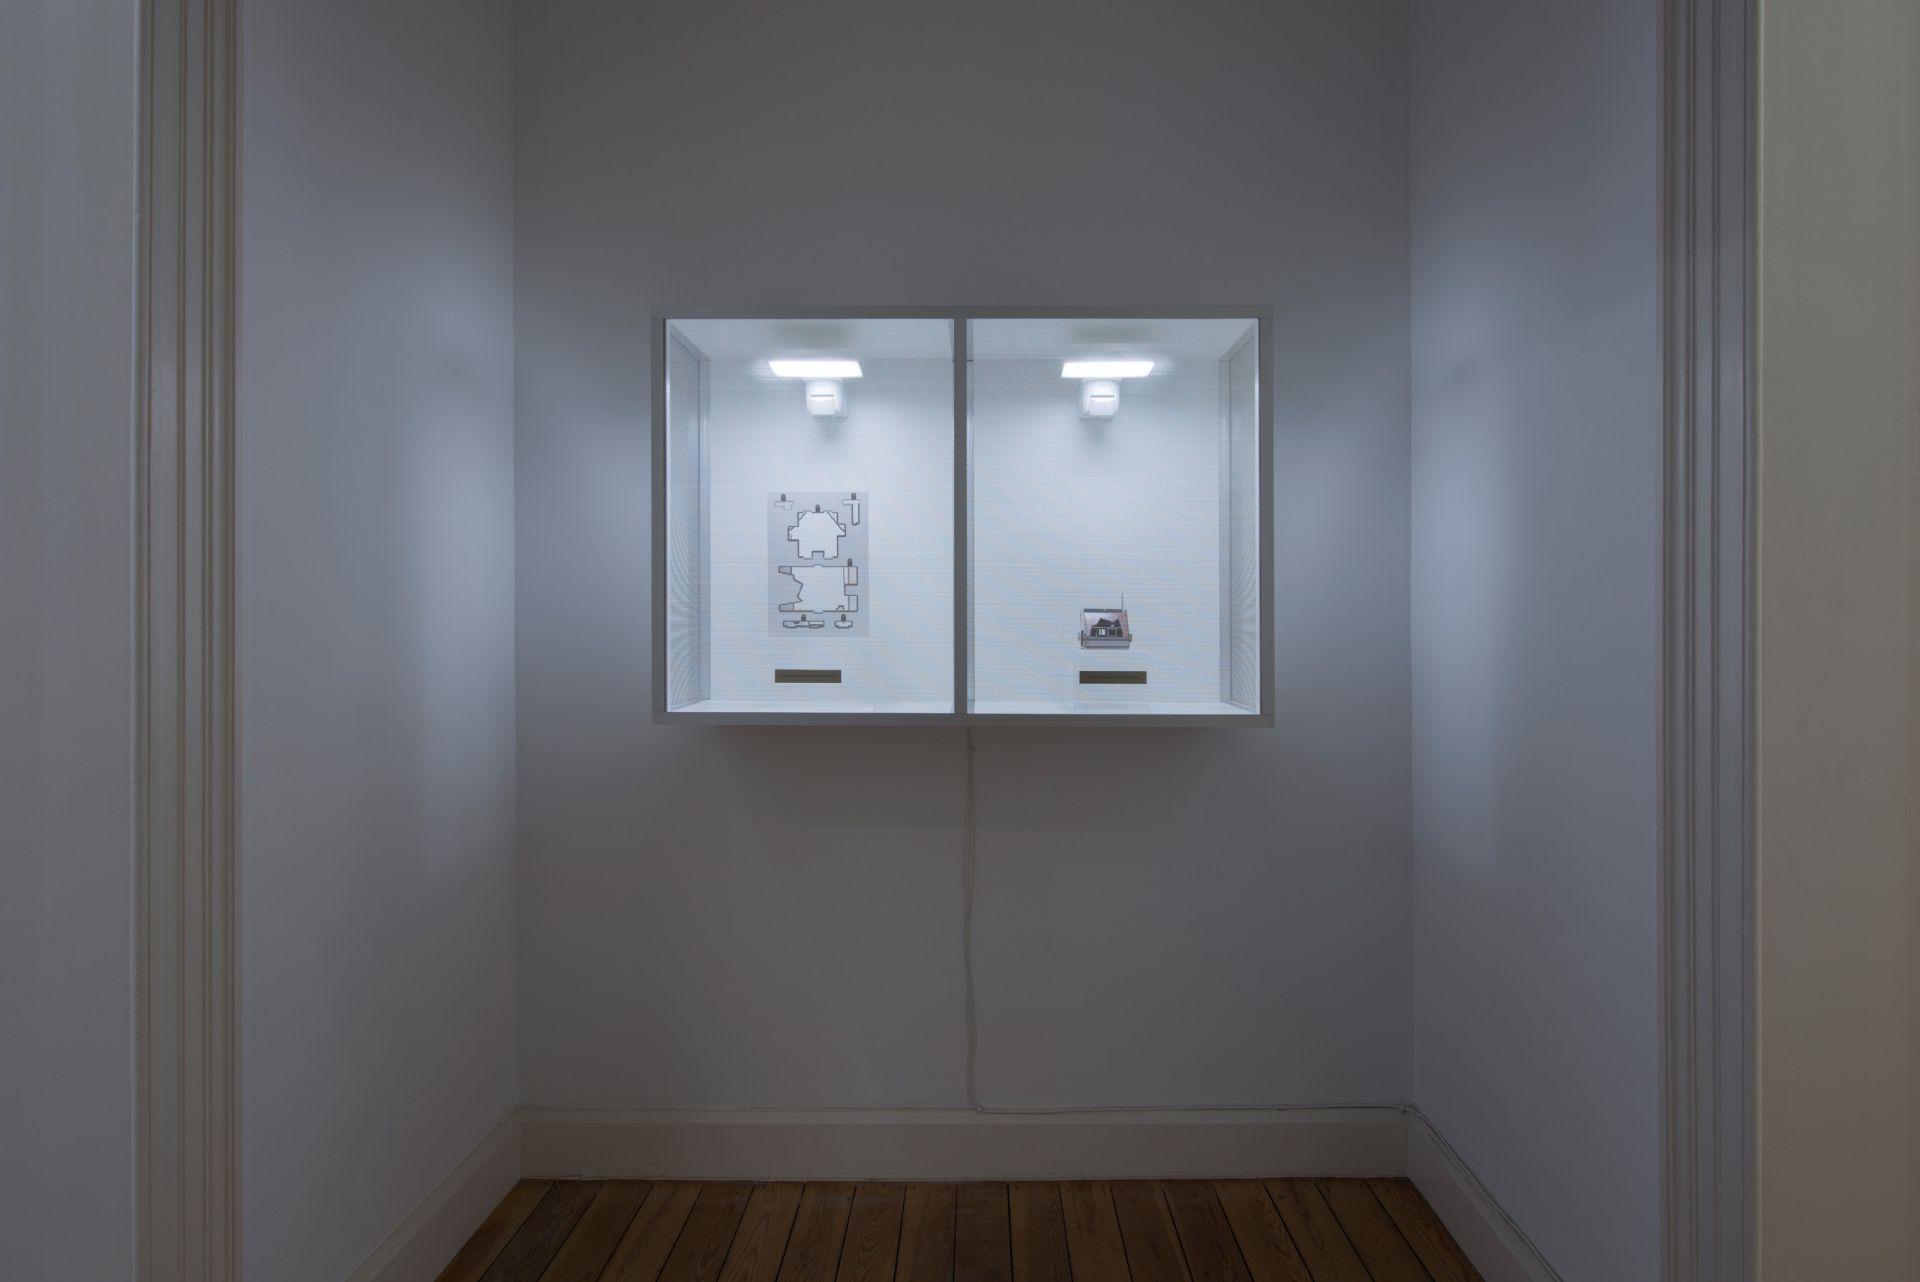 Simon Fujiwara, Innocent Material-Secret Annex (Negative), Secret Annex (Positive), 2017, Mixed media, 121×80.5×37.5cm, Unique